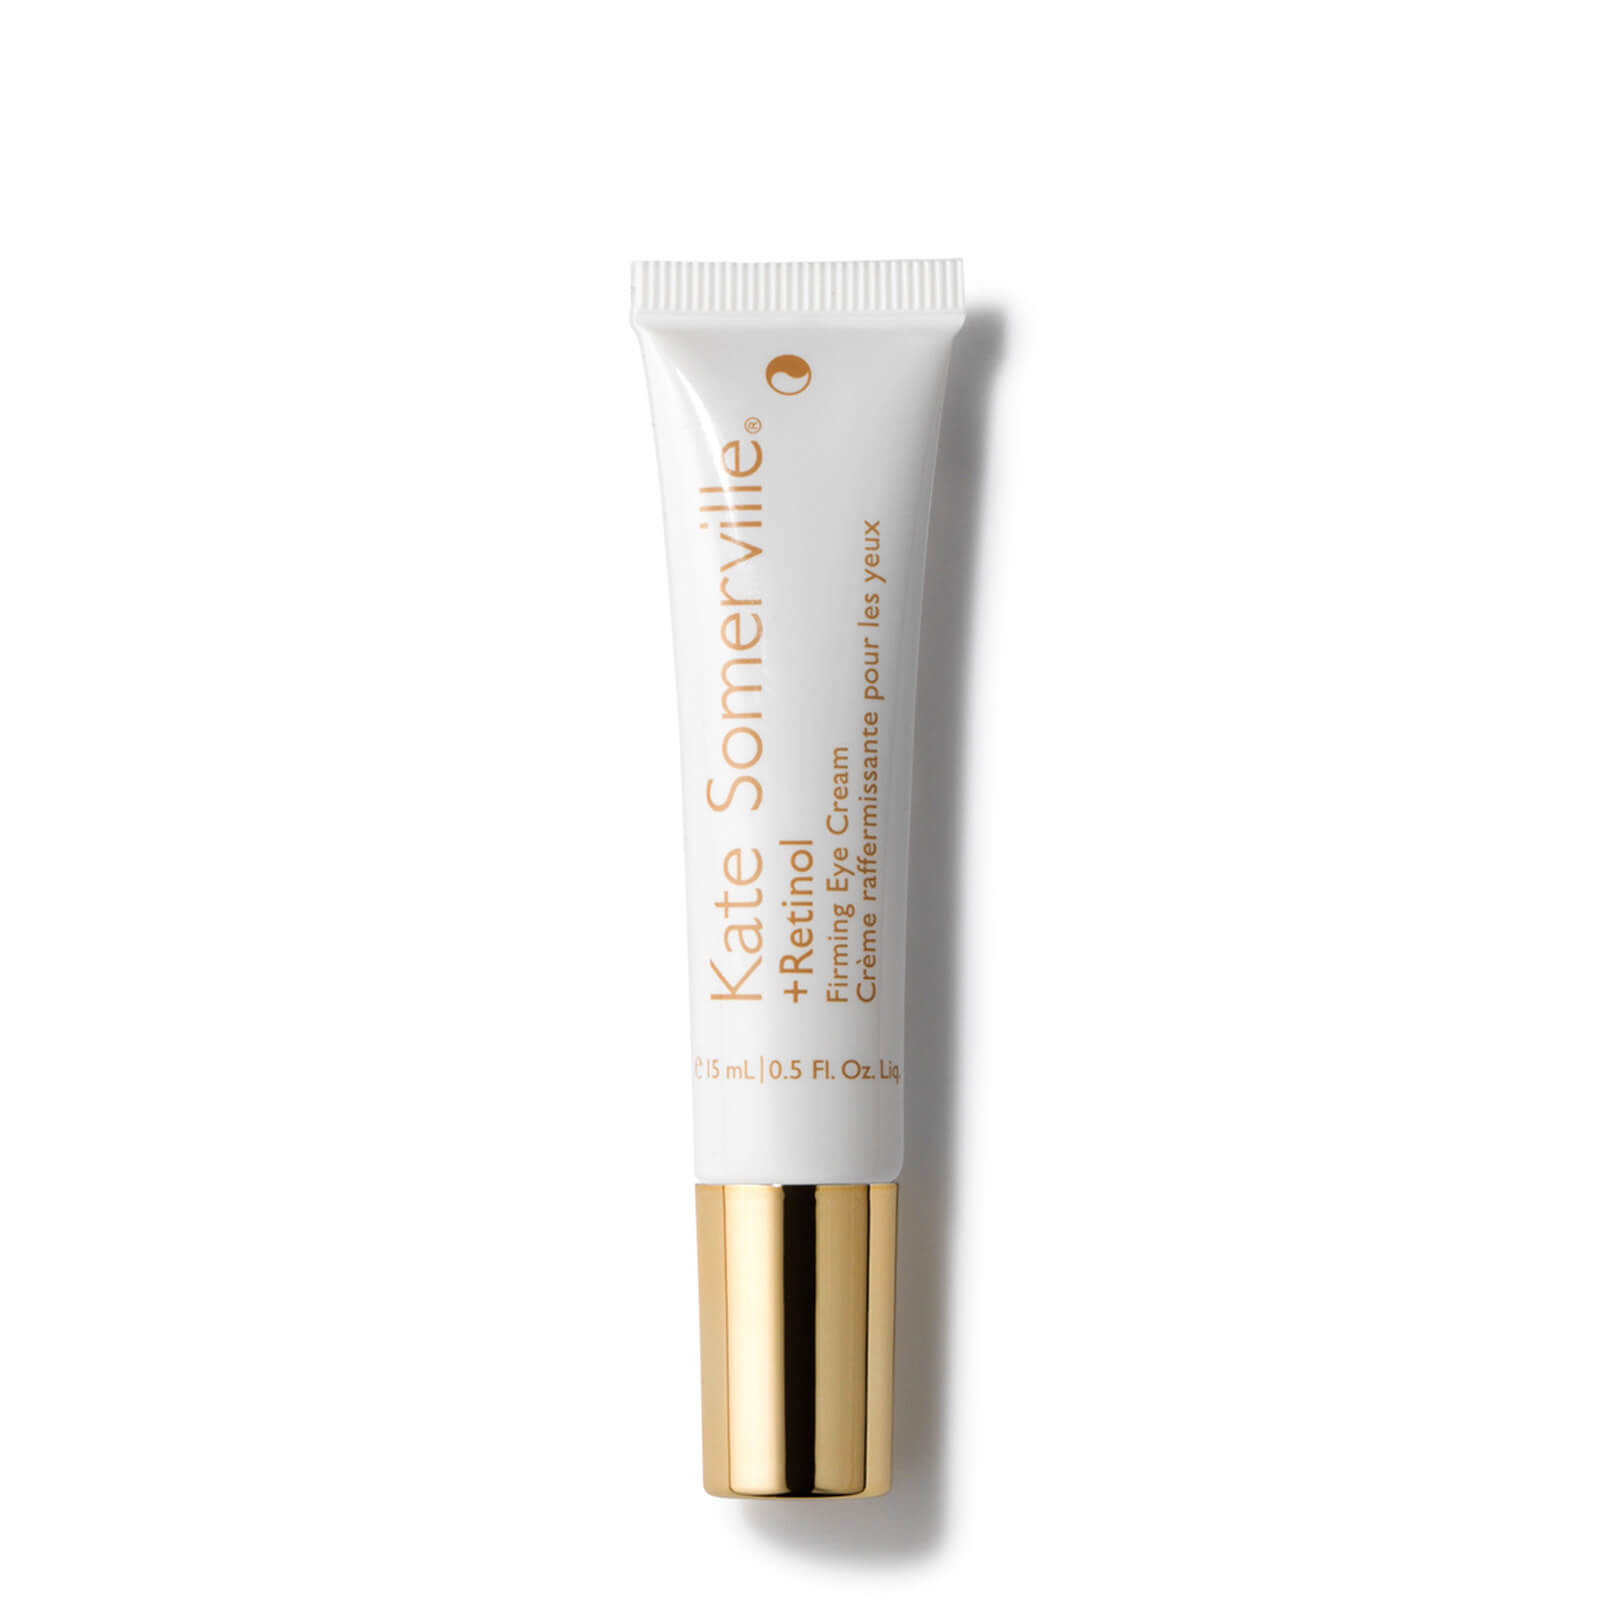 Kate Somerville + Retinol Firming Eye Cream 15ml